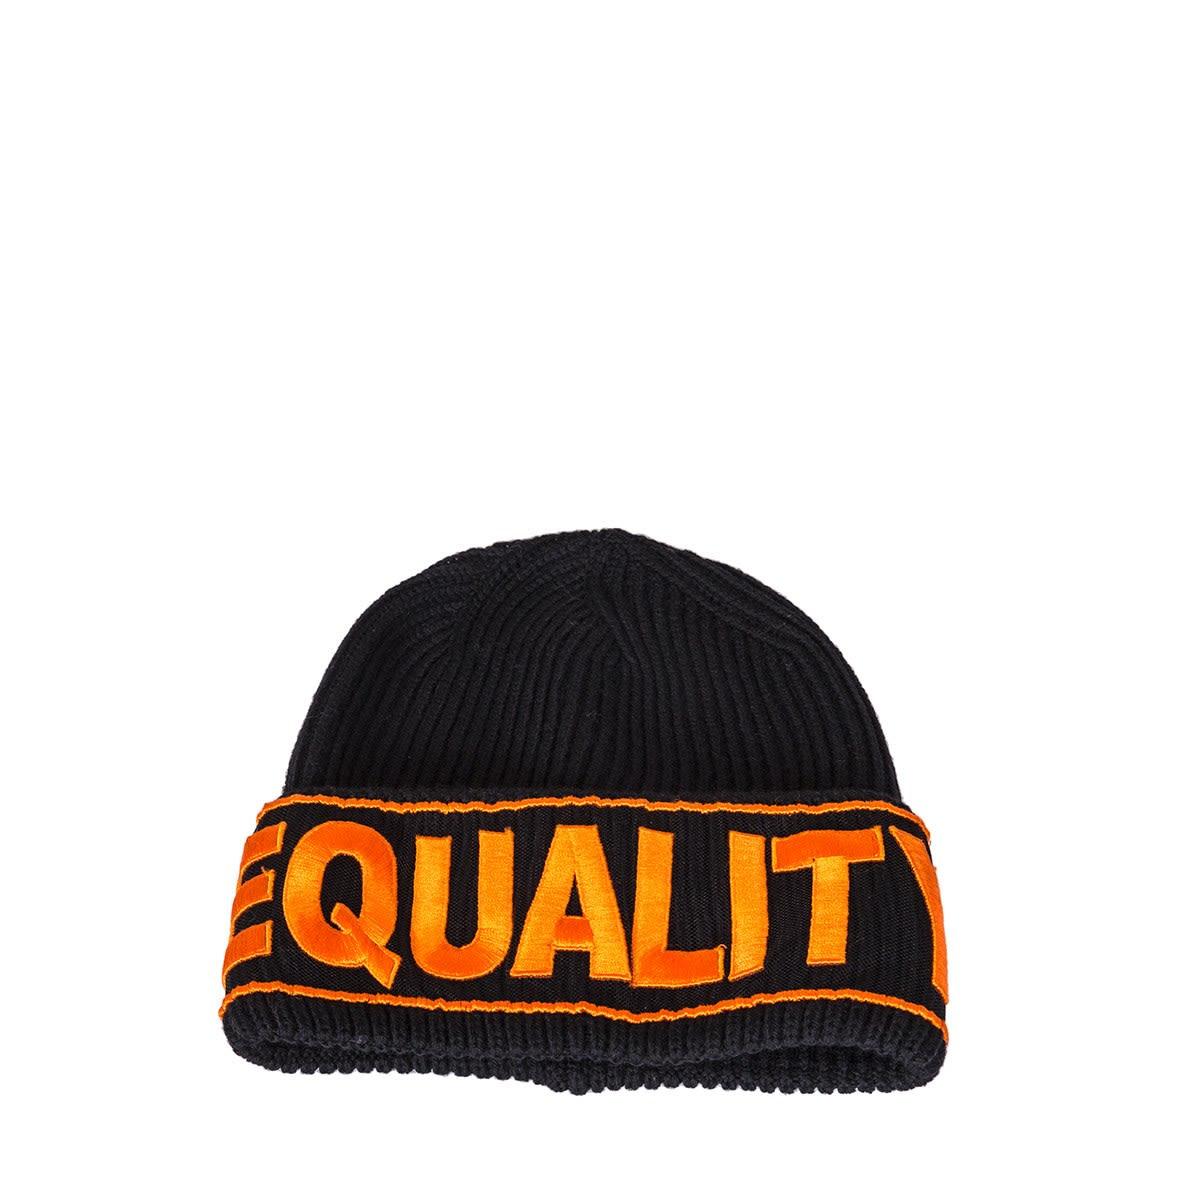 Equality Manifesto Hat